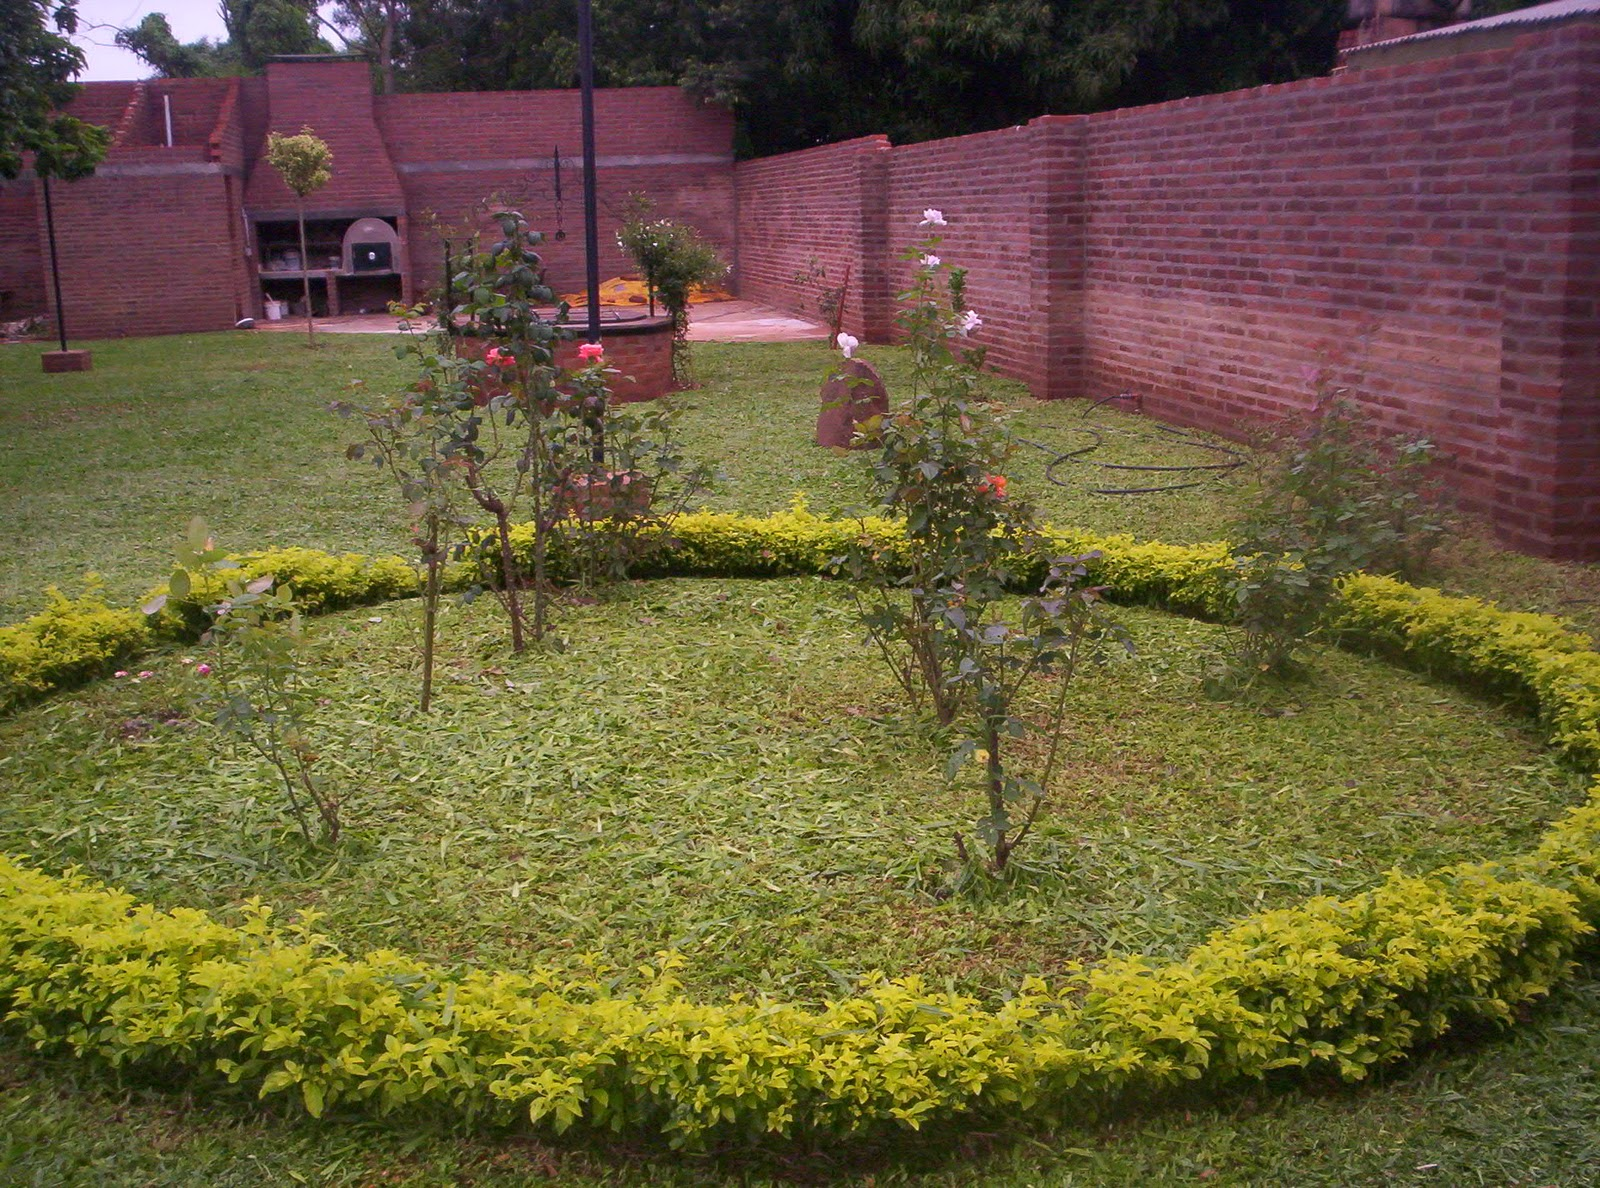 Paisajes y jardines duranta - Paisajes y jardines ...